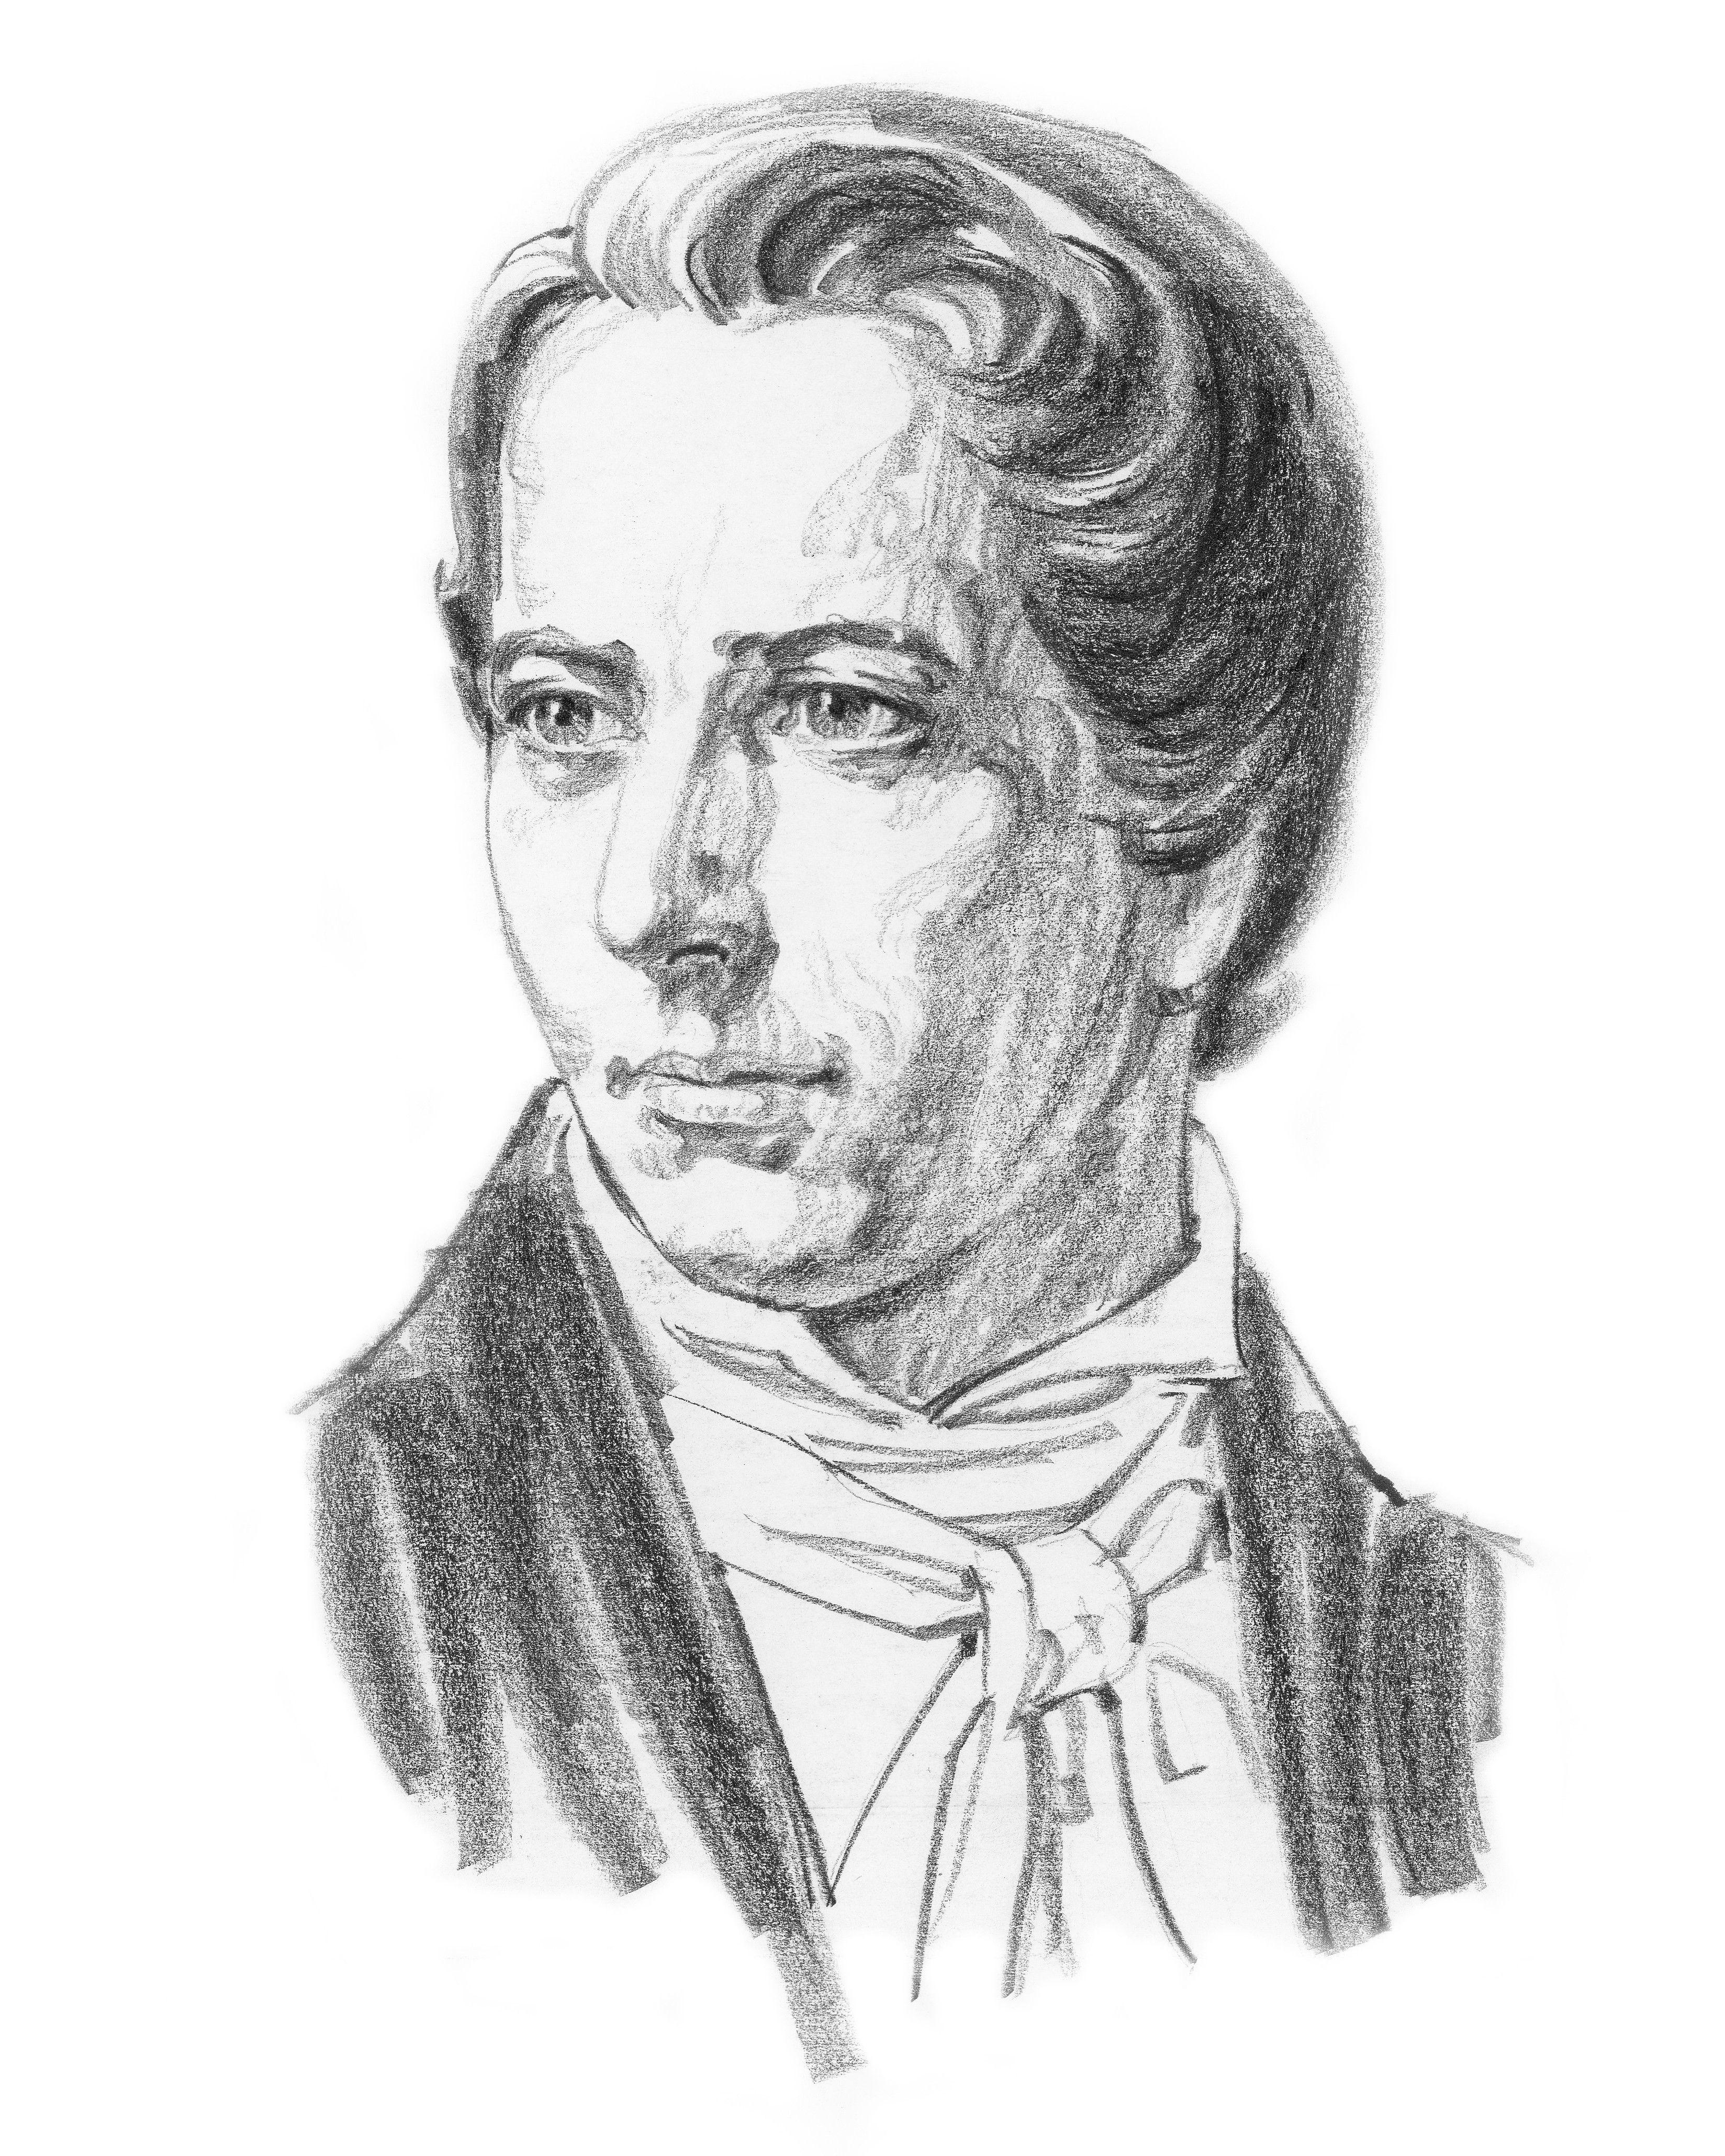 Joseph Smith, Jr., by Jerry Harston